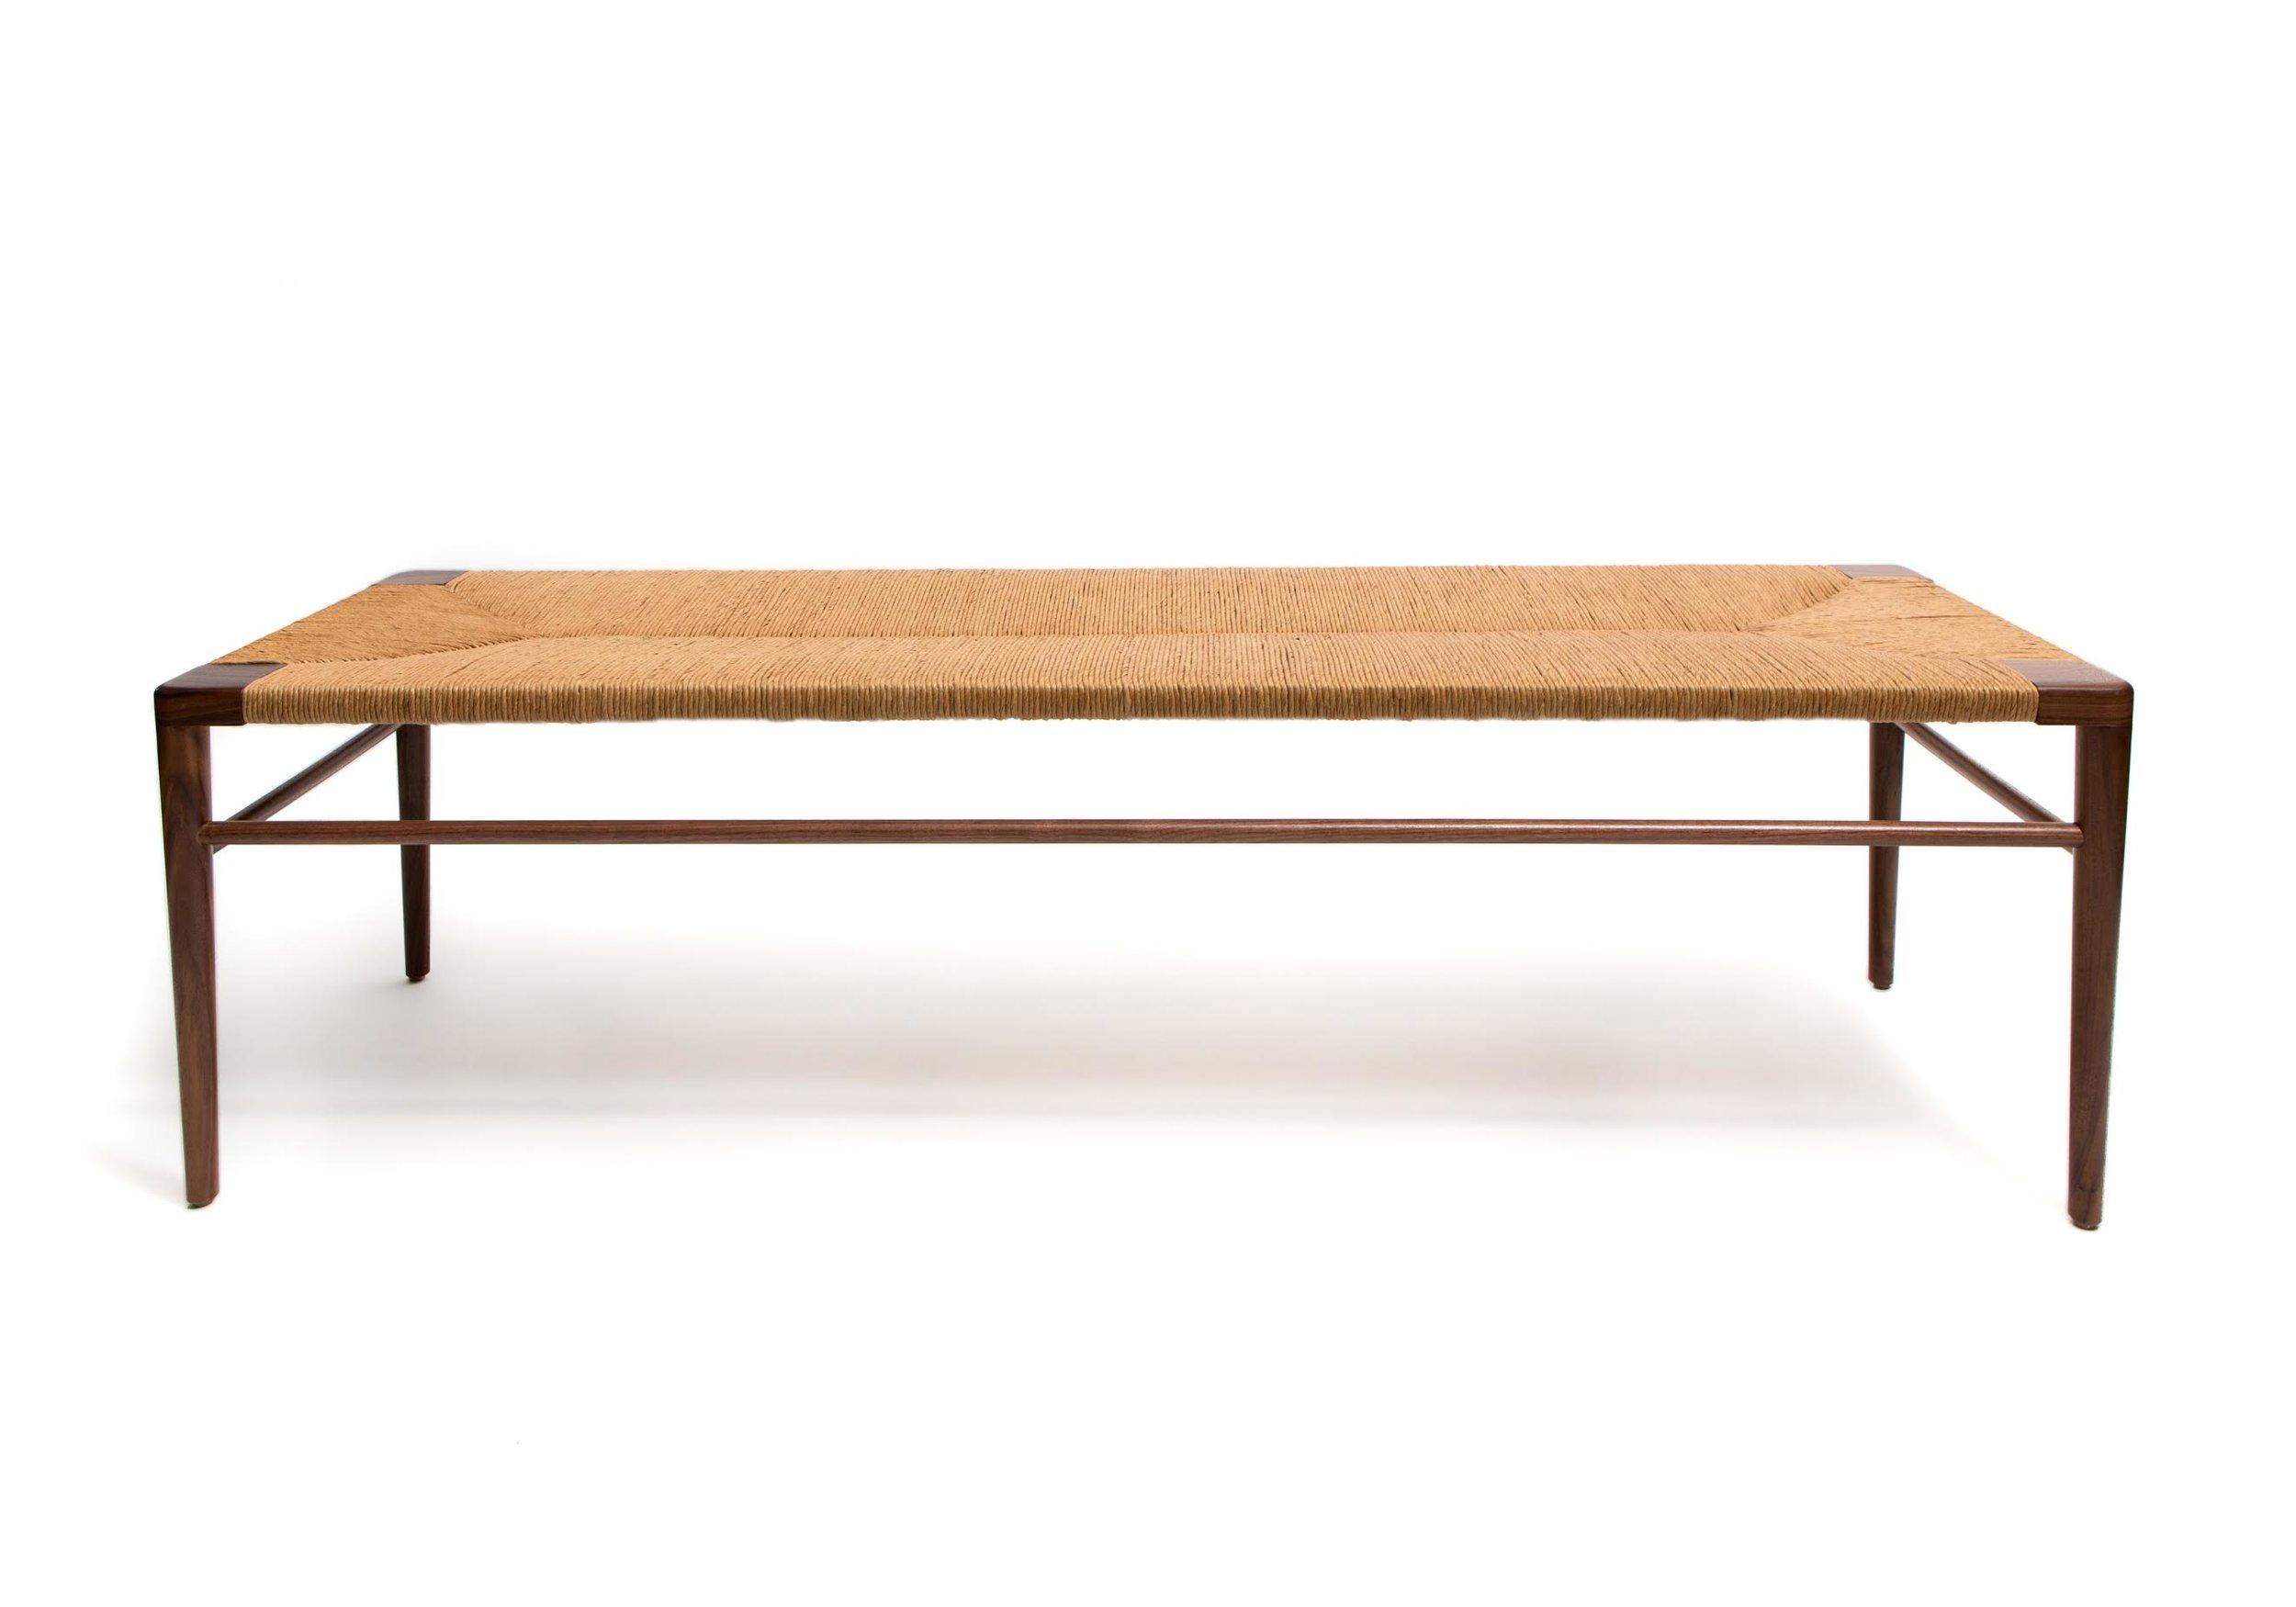 smilow furniture woven rush bench most shopped item